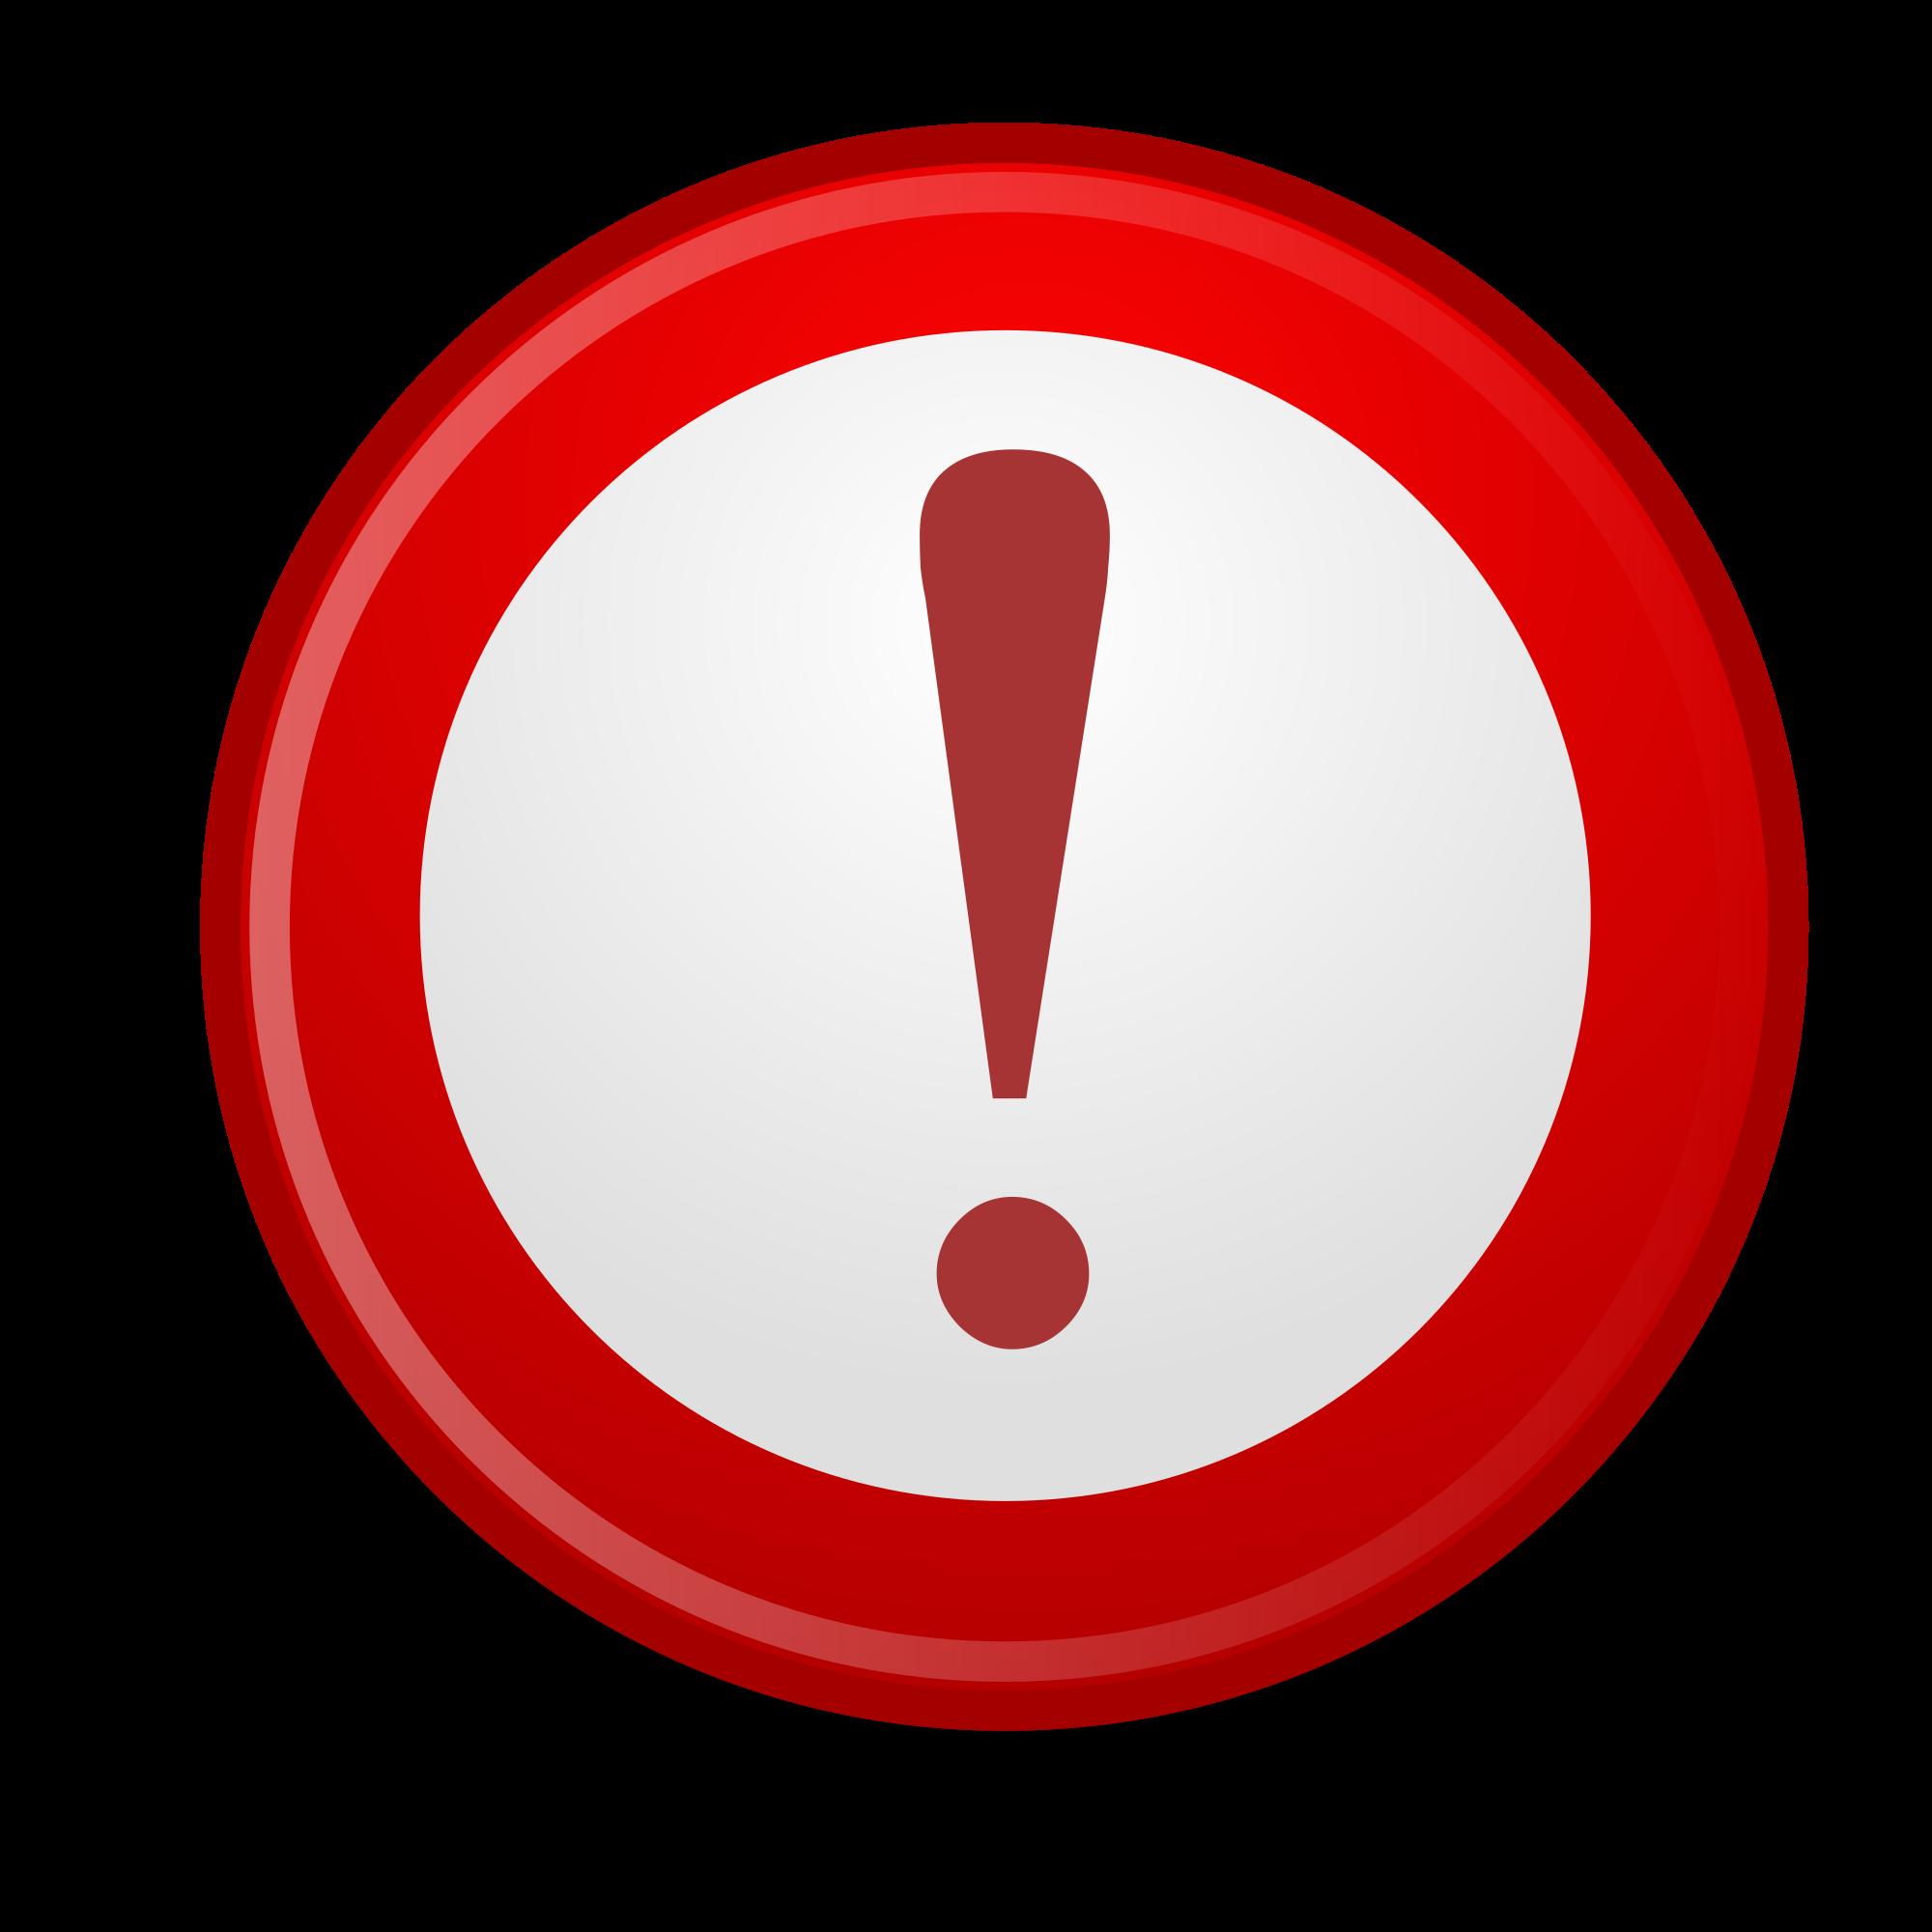 Important clipart explanation mark. File gnome emblem svg